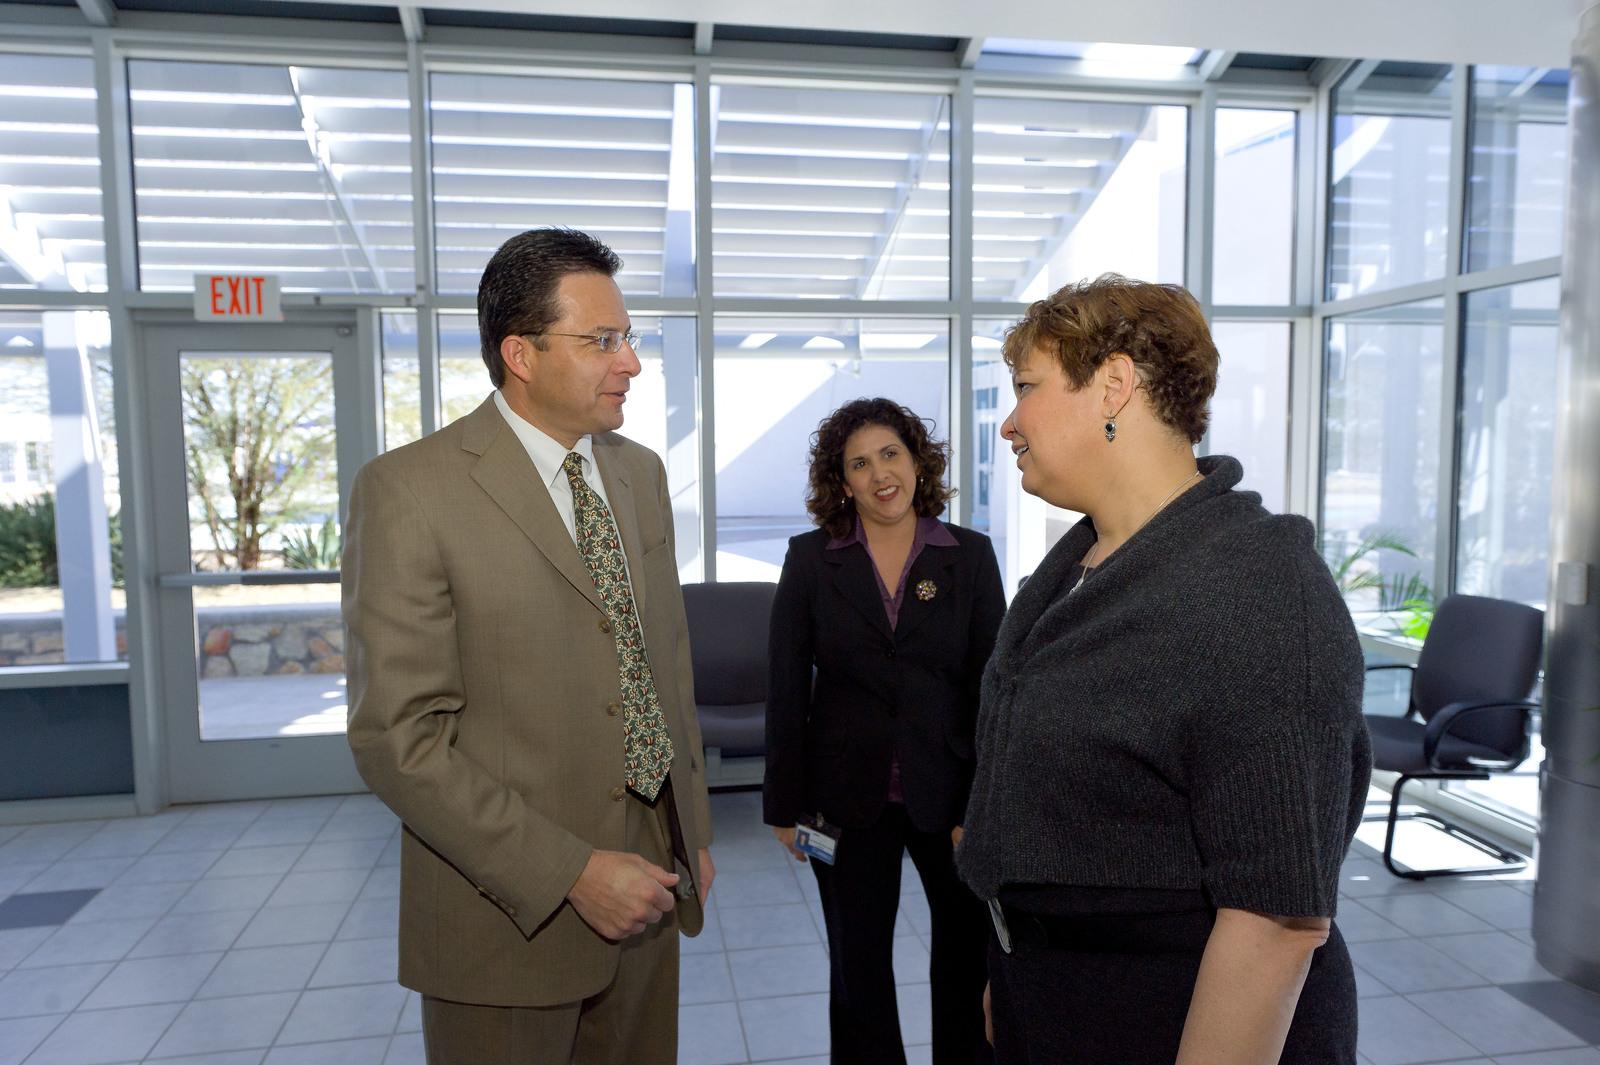 Office of the Administrator (Lisa P. Jackson) - El Paso [412-APD-649-2011-01-27_El_Paso_081.jpg]